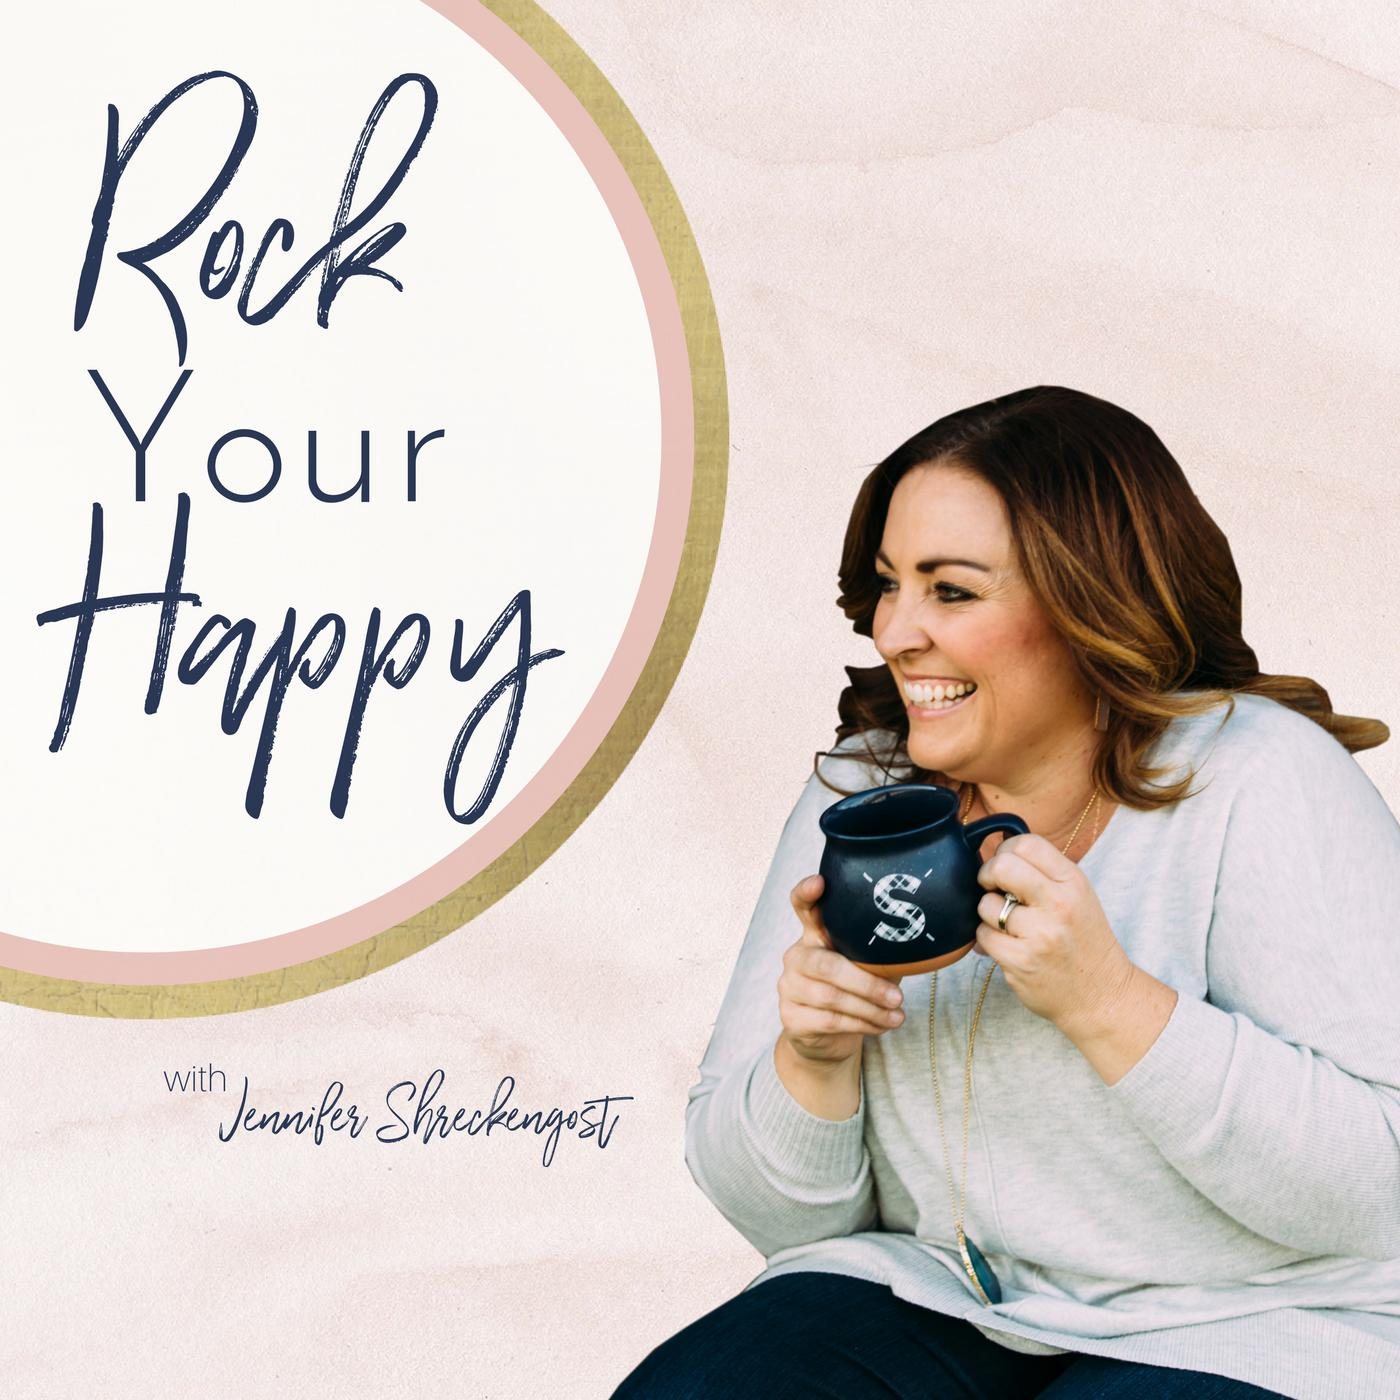 Rock Your Happy (podcast) - Jennifer Shreckengost - women's